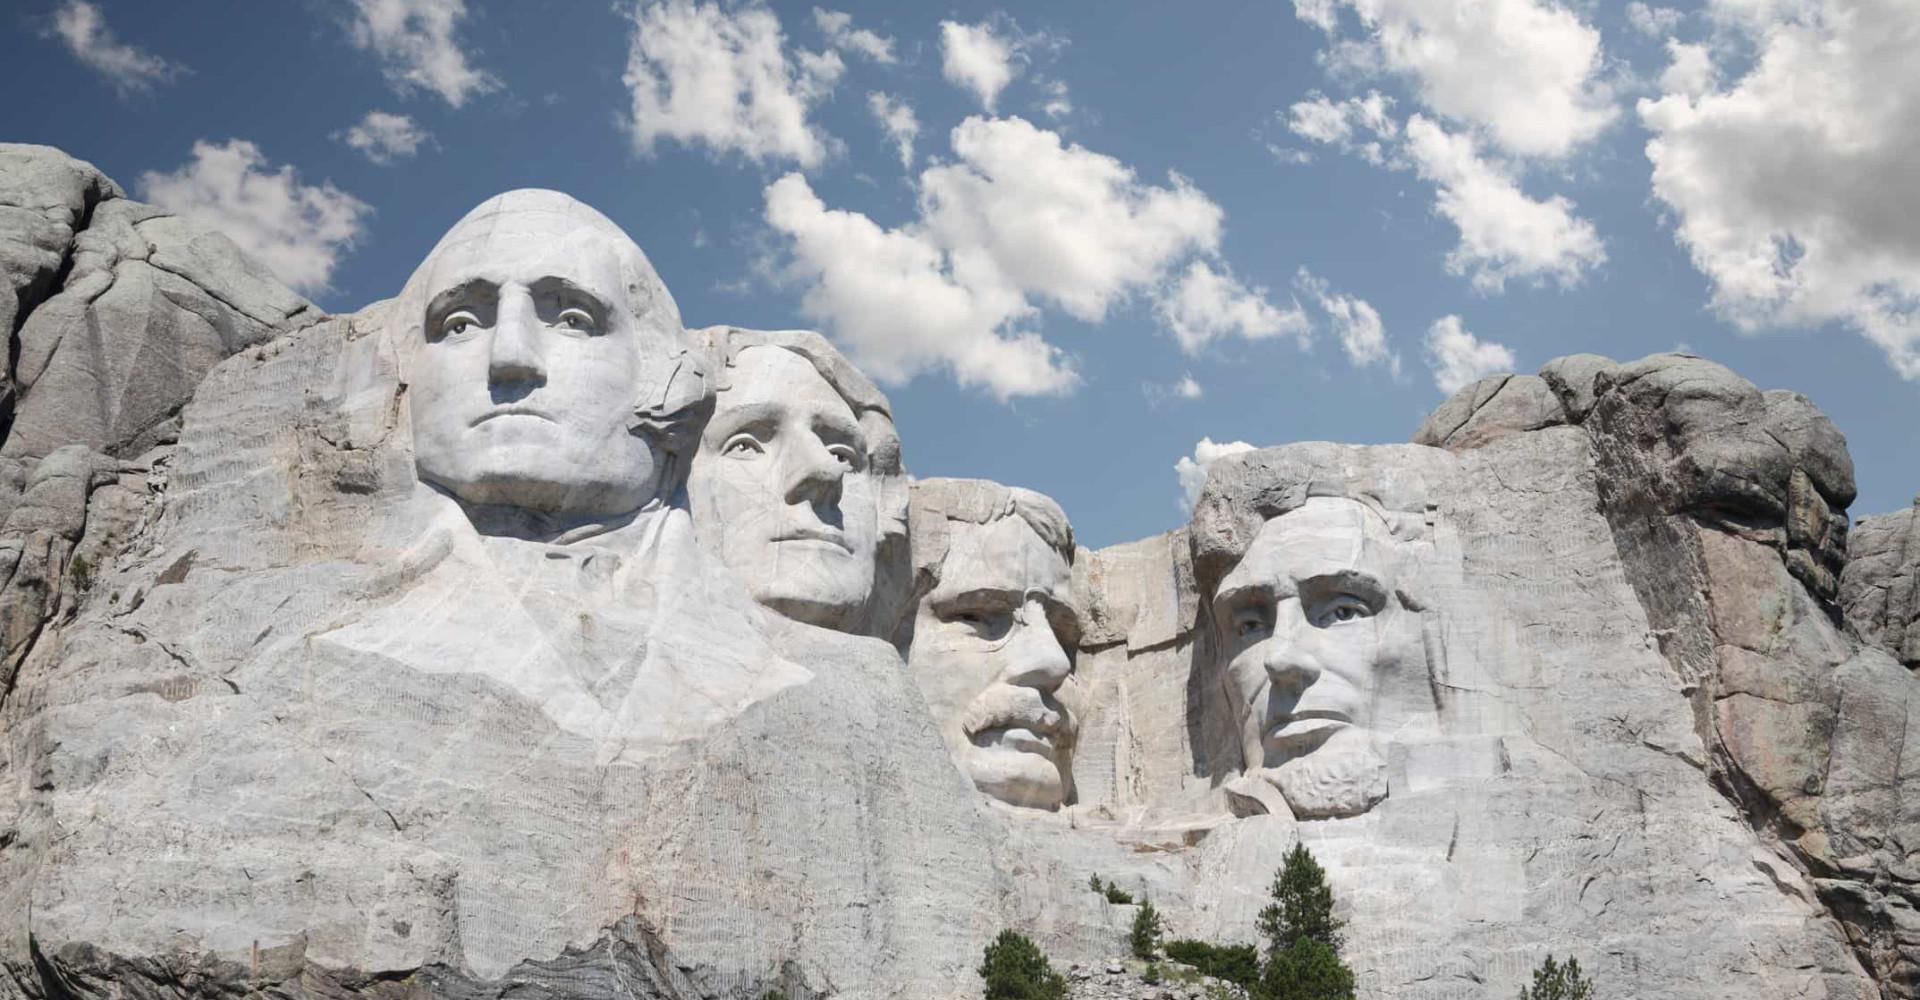 Surprising secrets hidden in American national landmarks